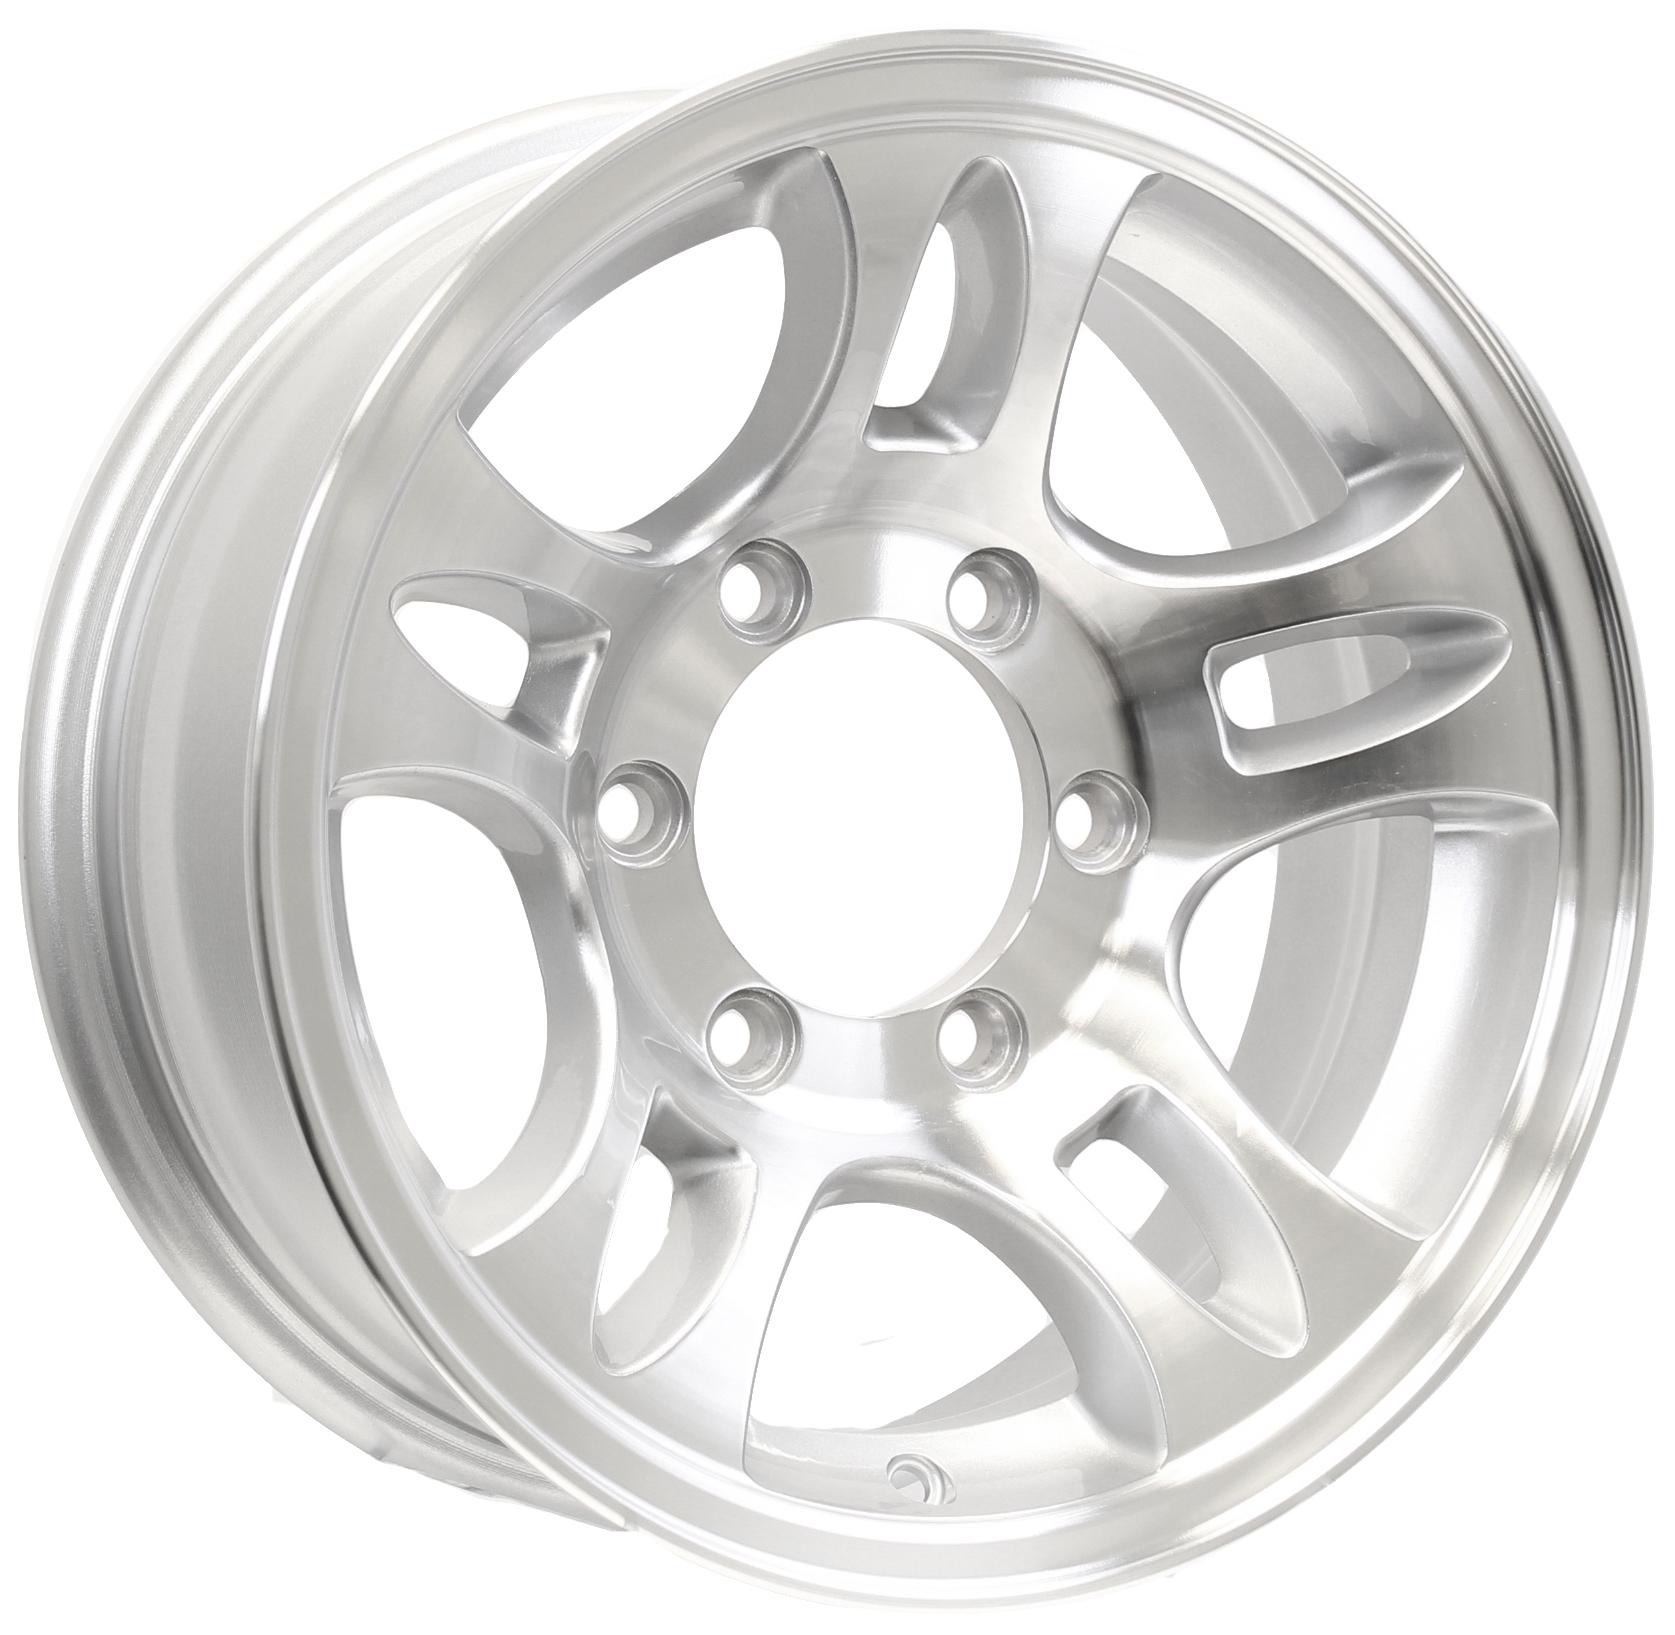 "T03 15"" 6-5.5 Silver Aluminum Trailer Wheel Image"